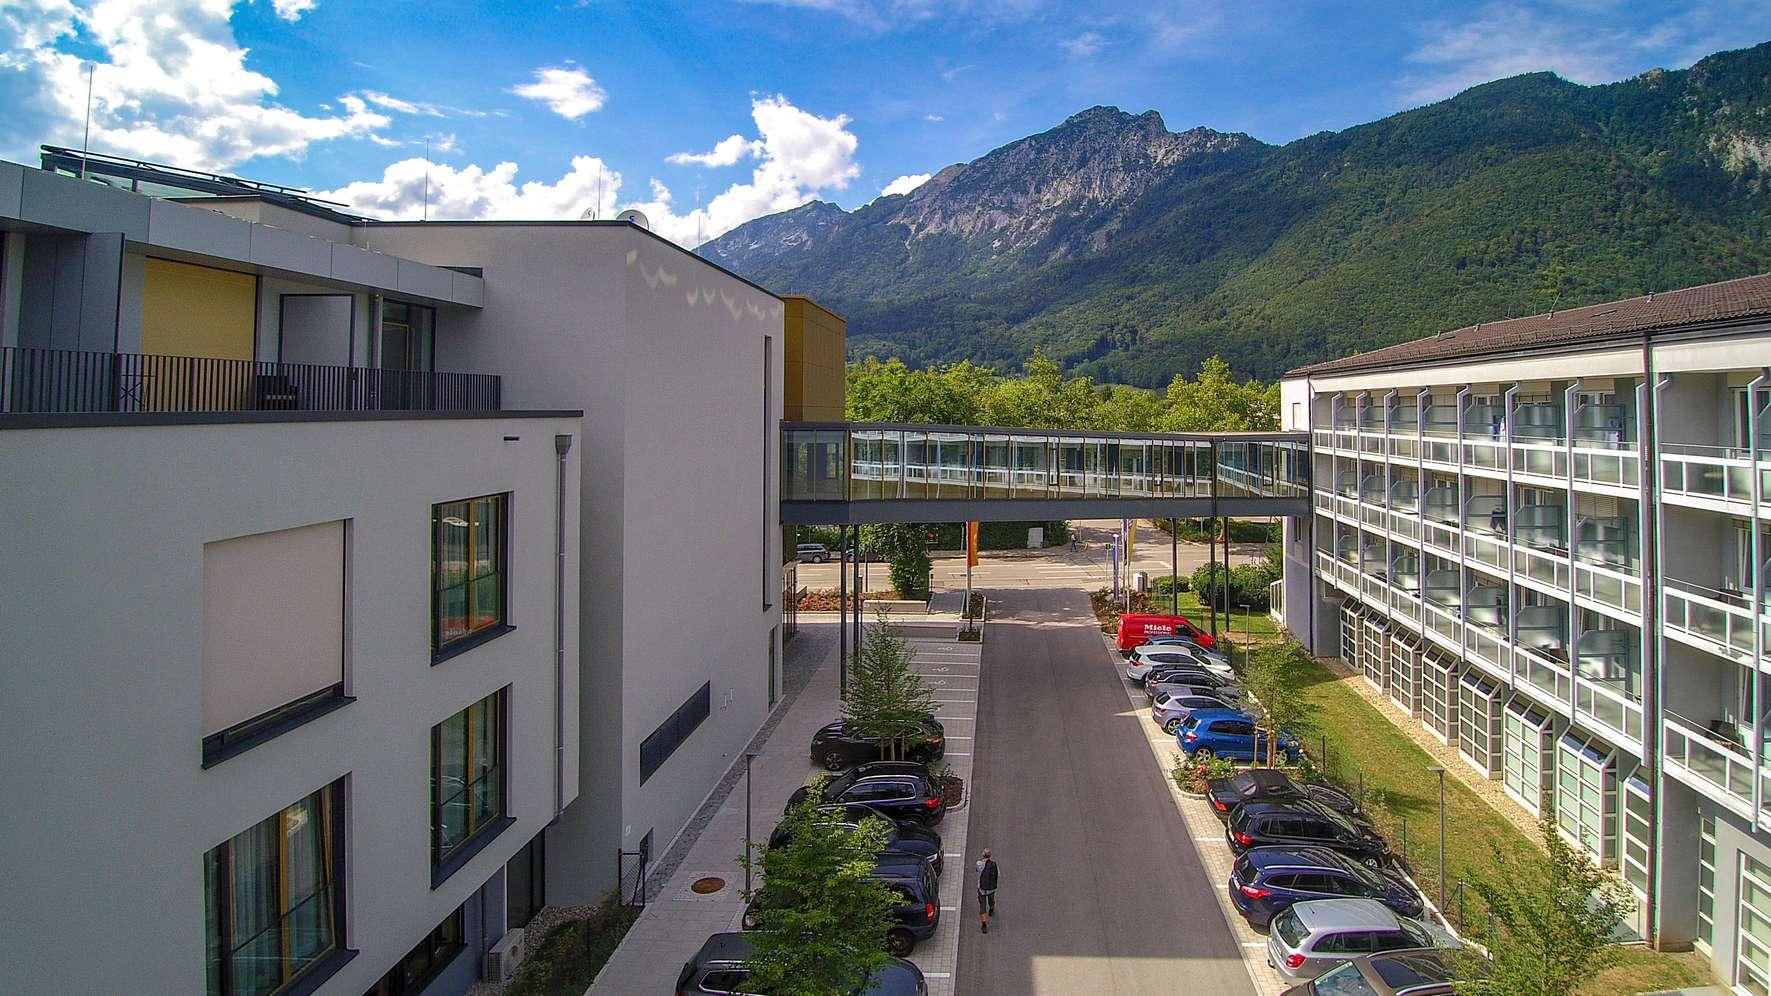 BG Klinik Bad Reichenhall